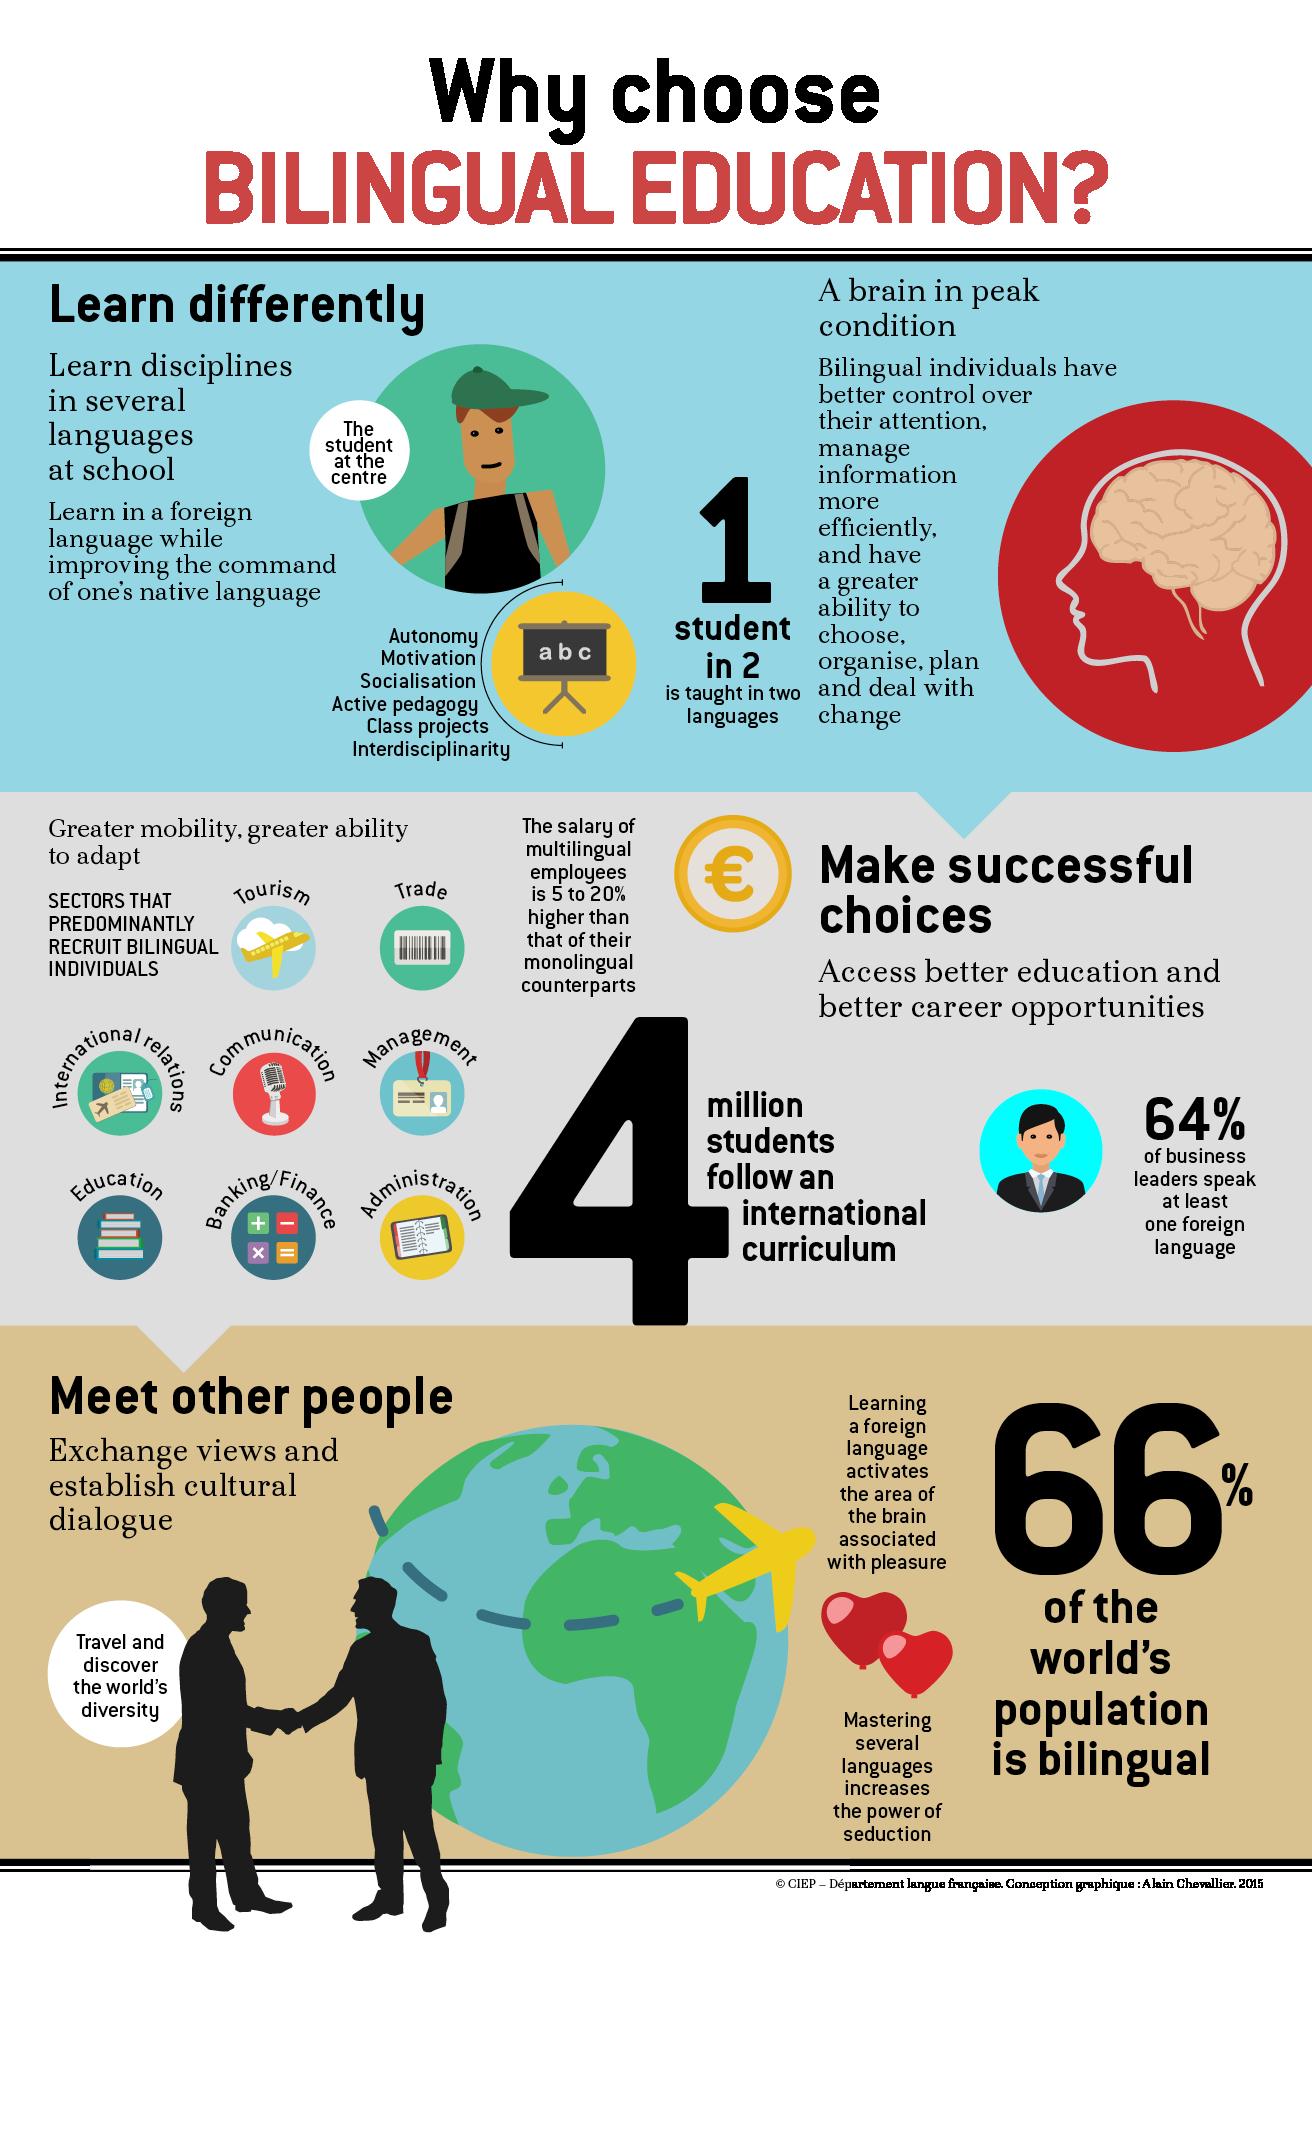 Why Choose Bilingual Education